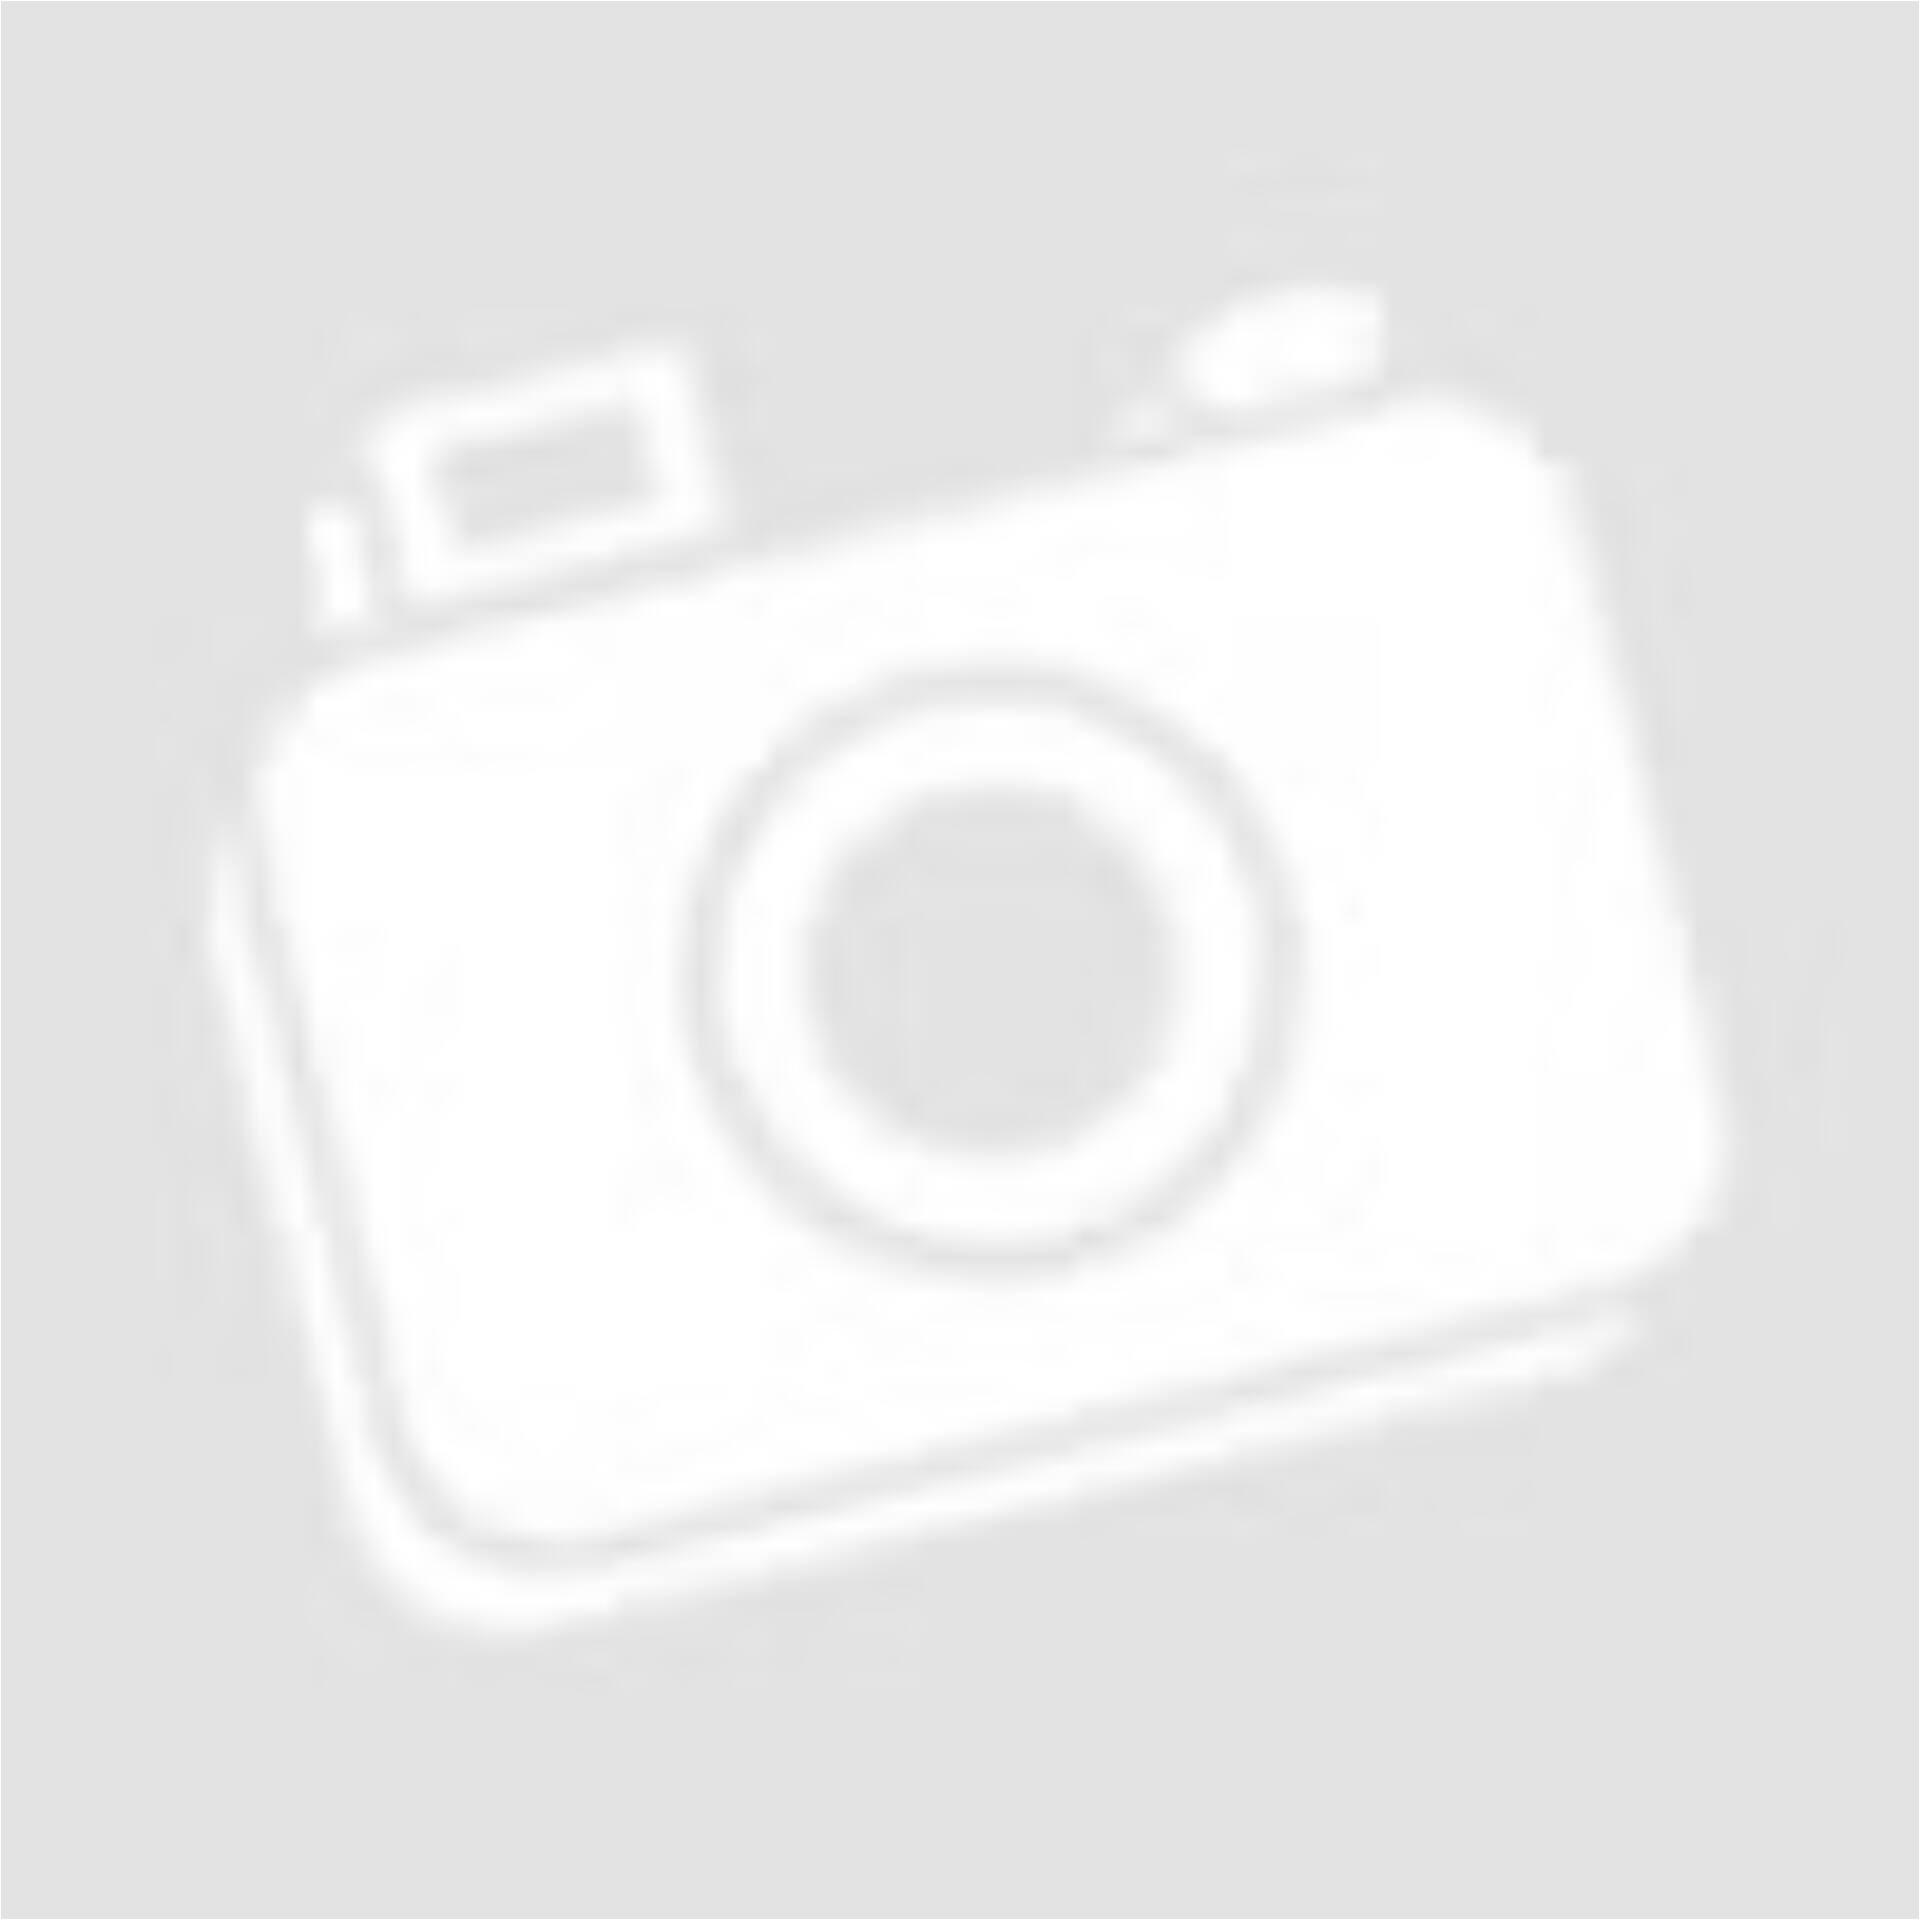 MUSTANG kék színű férfi pulóver (Méret  L) - Pulóver 918cbbd6d9